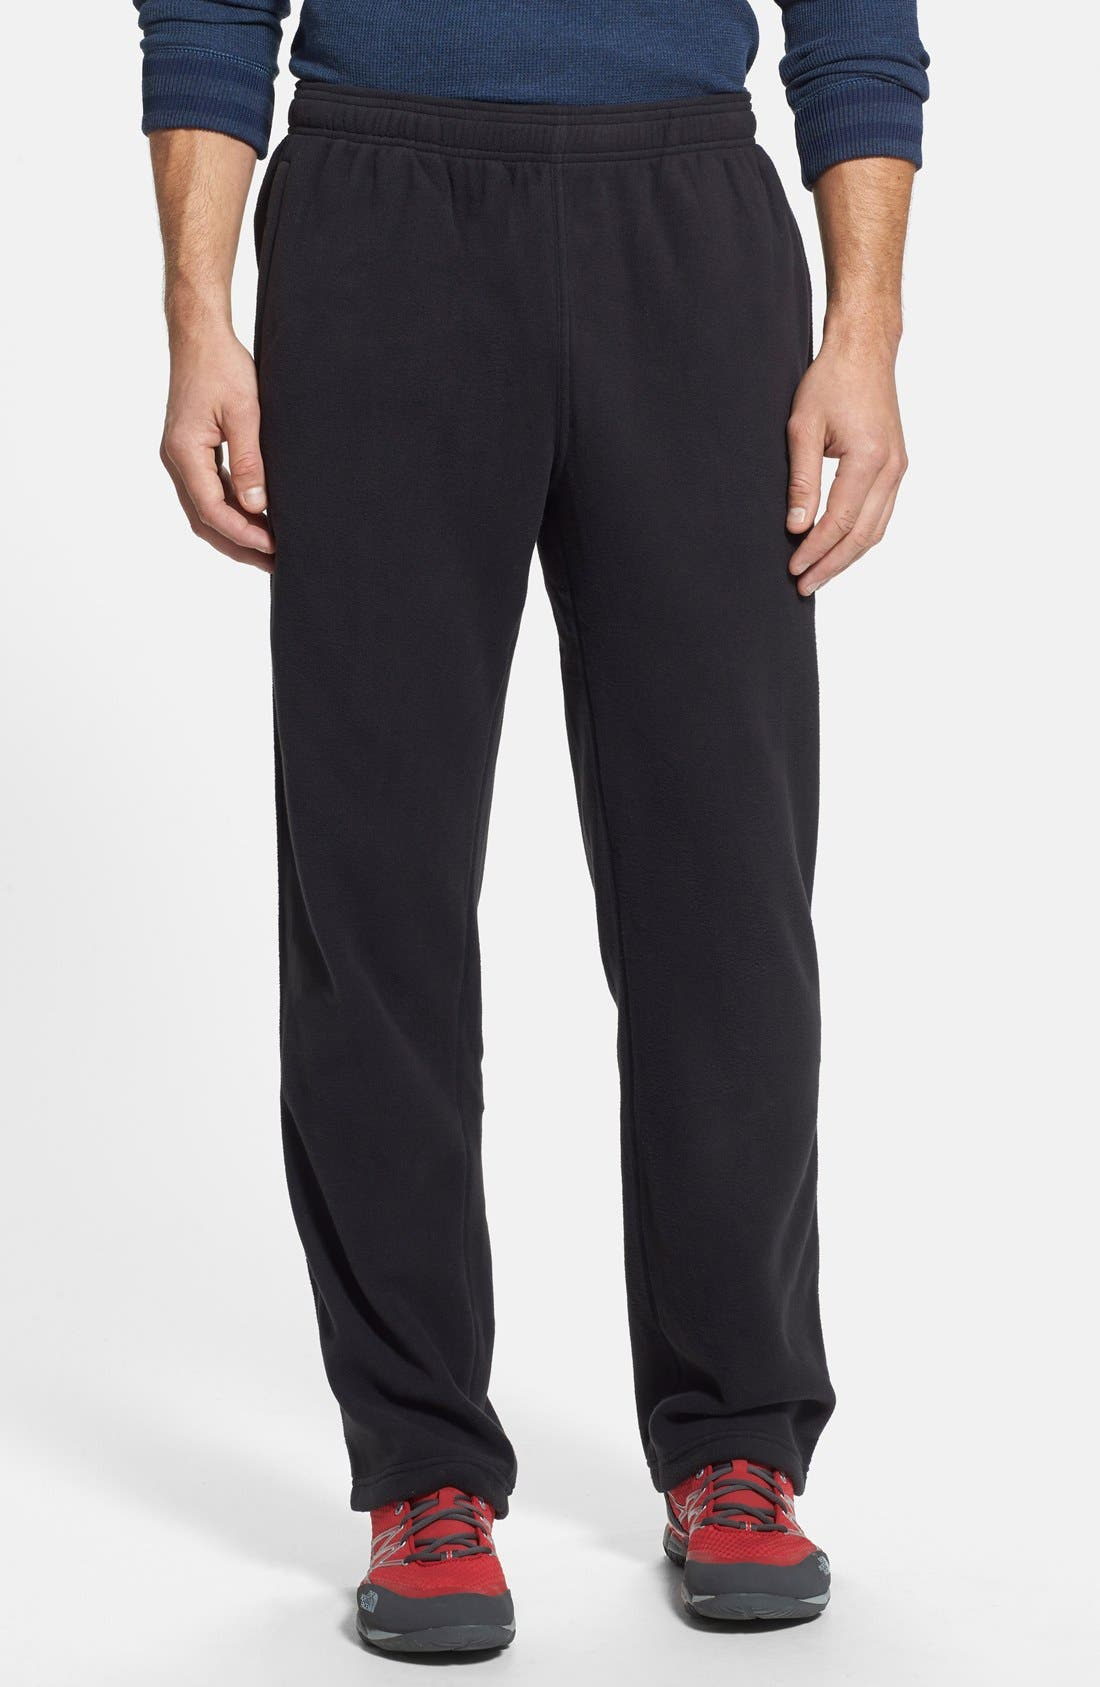 Main Image - The North Face 'TKA 100' Fleece Pants